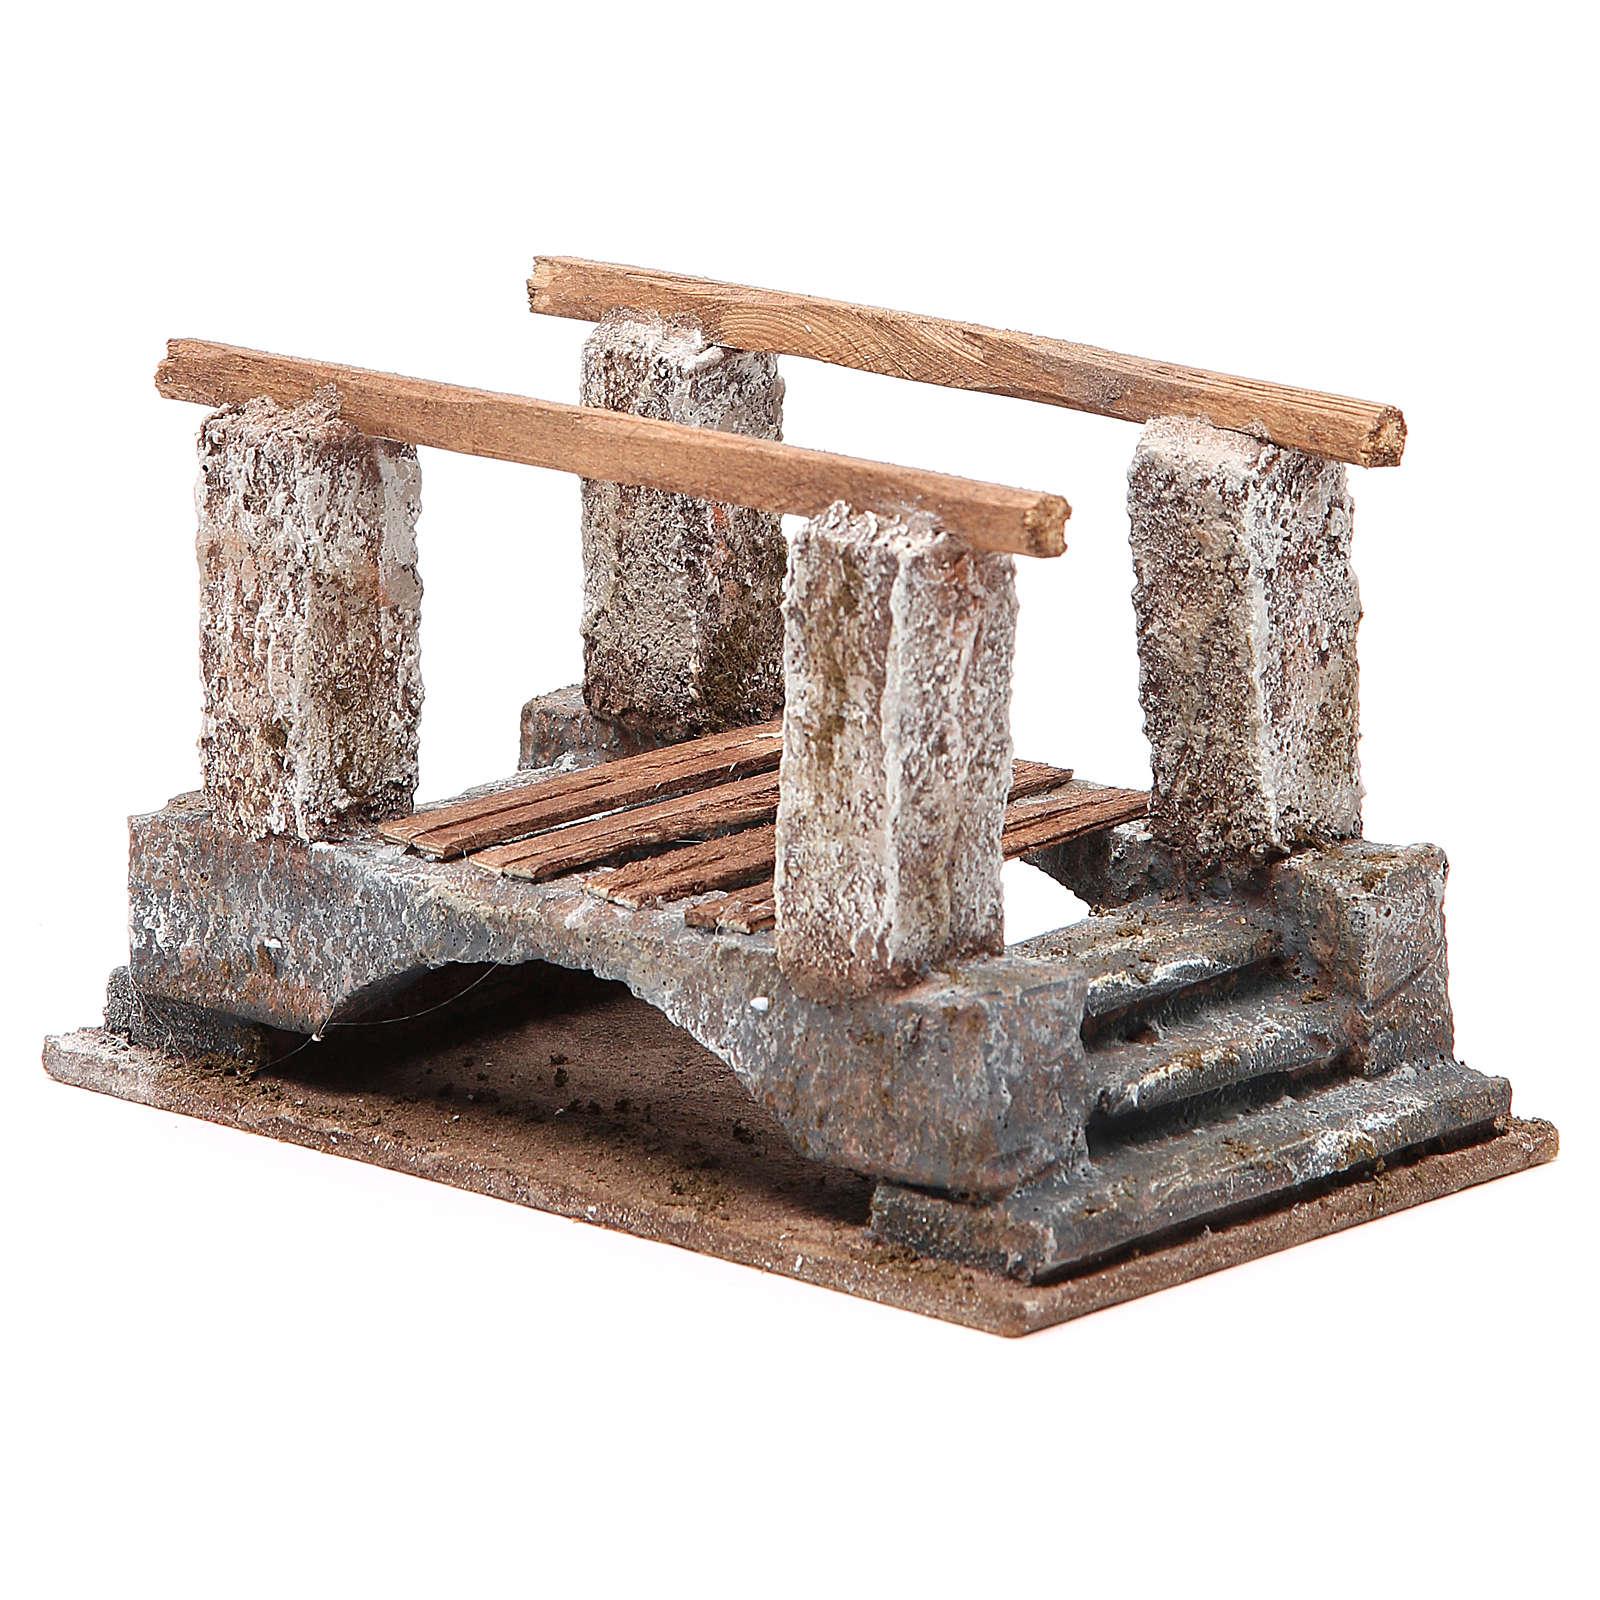 Puente belén con parapeto madera 10x18x11 cm 4